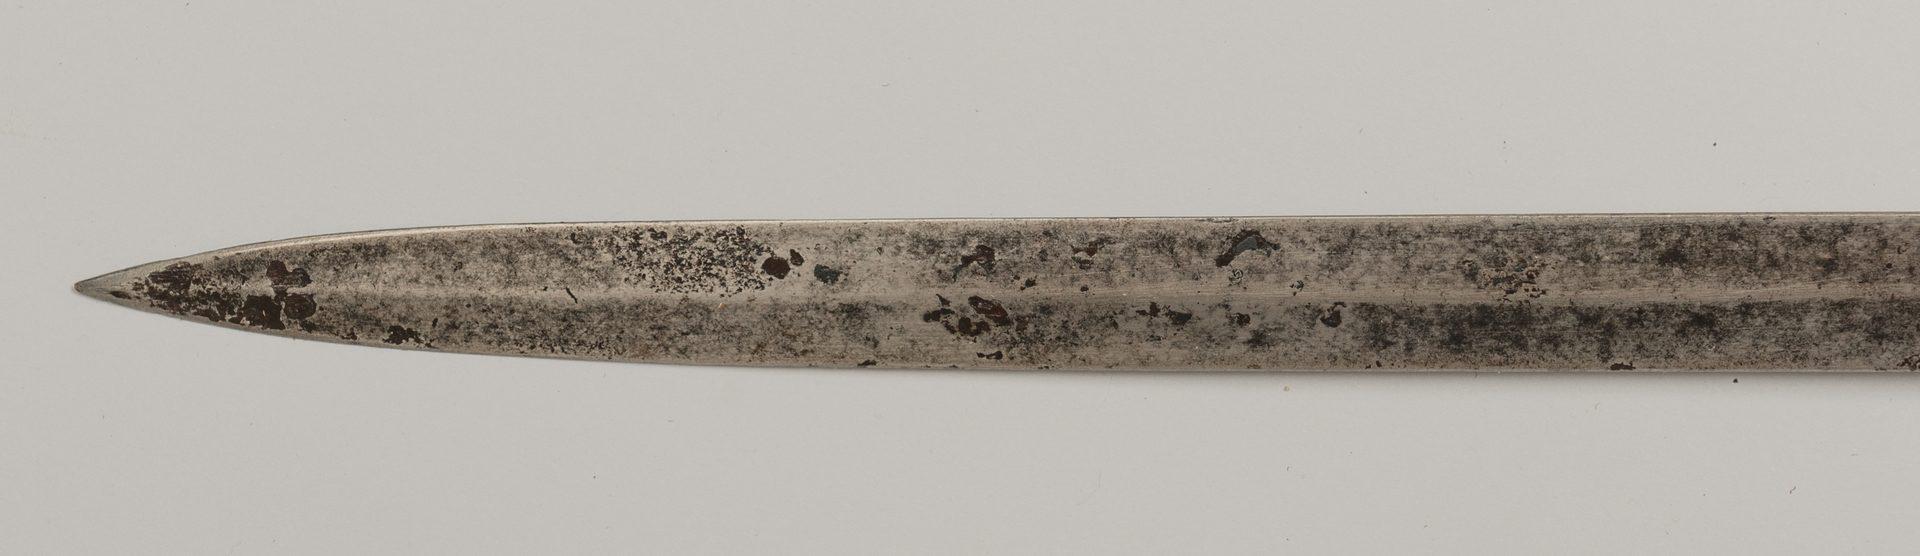 Lot 239: Model 1850 Solengen Staff & Field Sword